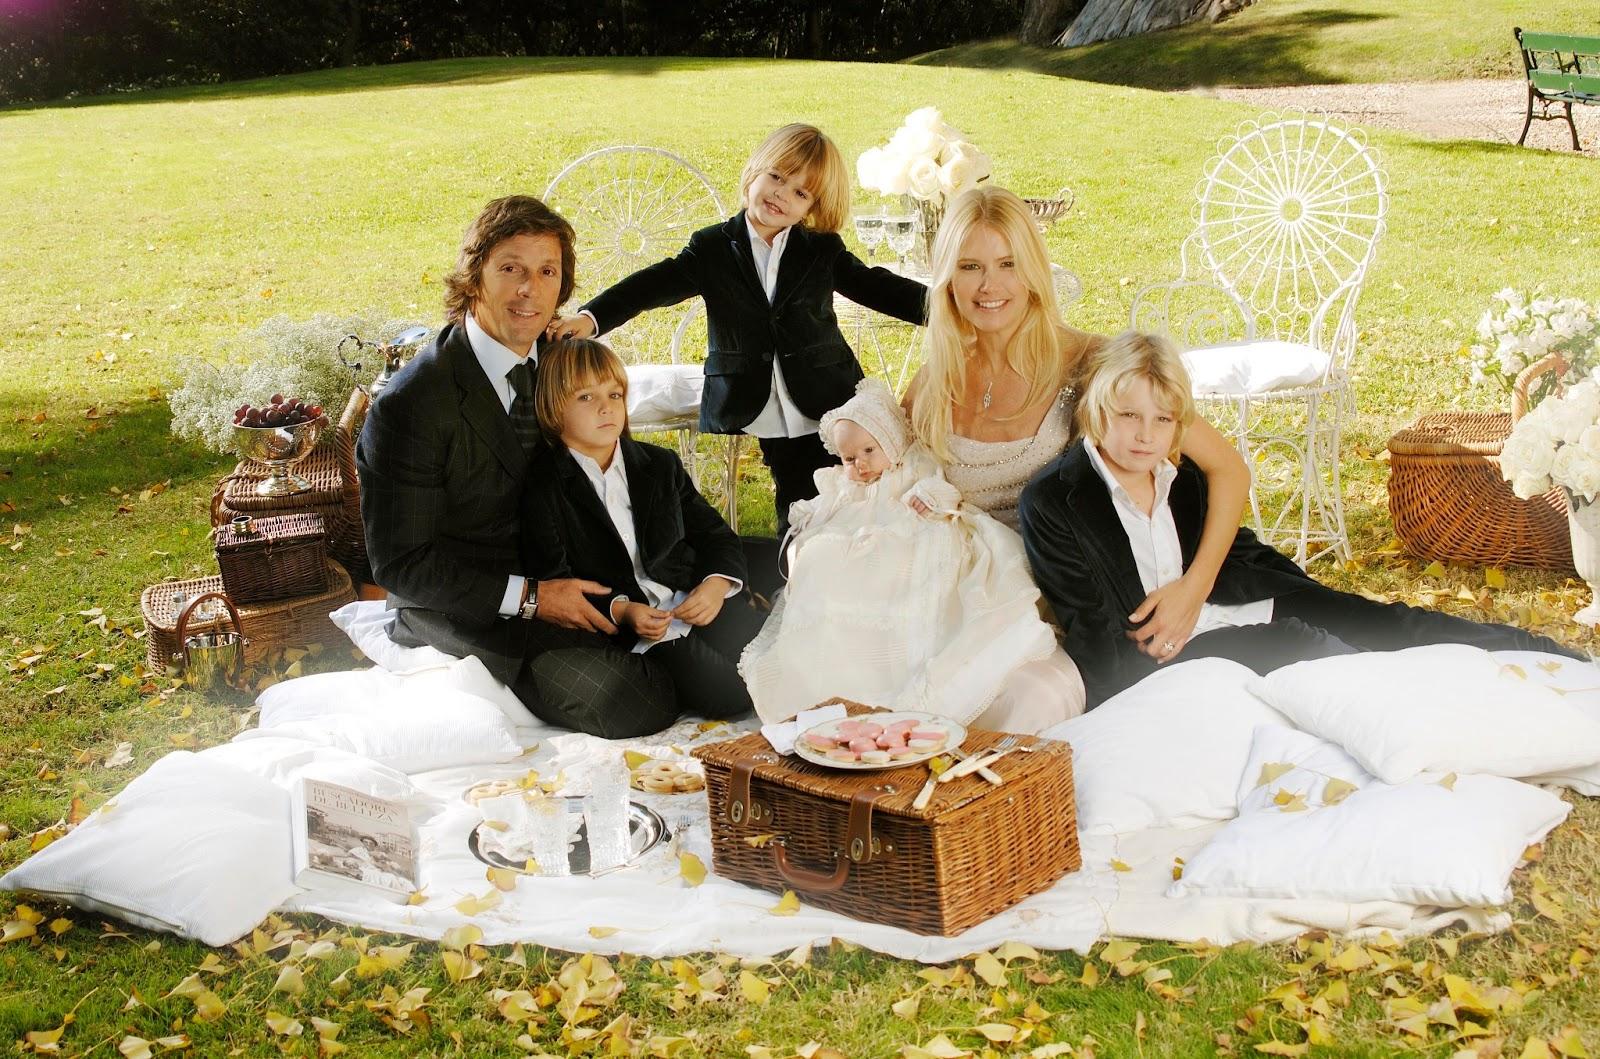 Valeria Mazza & her family,